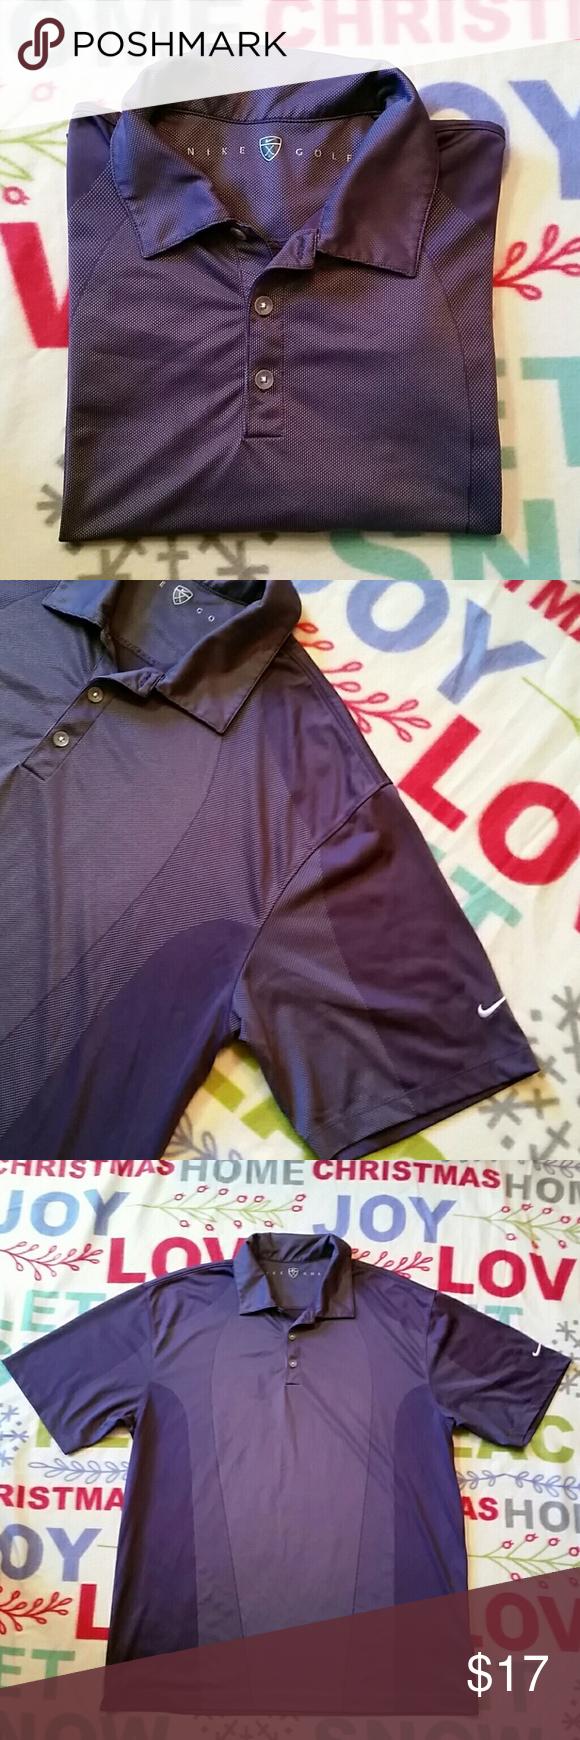 Mens Nike Golf Polo Shirt Stylish golf Shortsleeve shirt. In really good condition. Nike Golf Shirts Polos